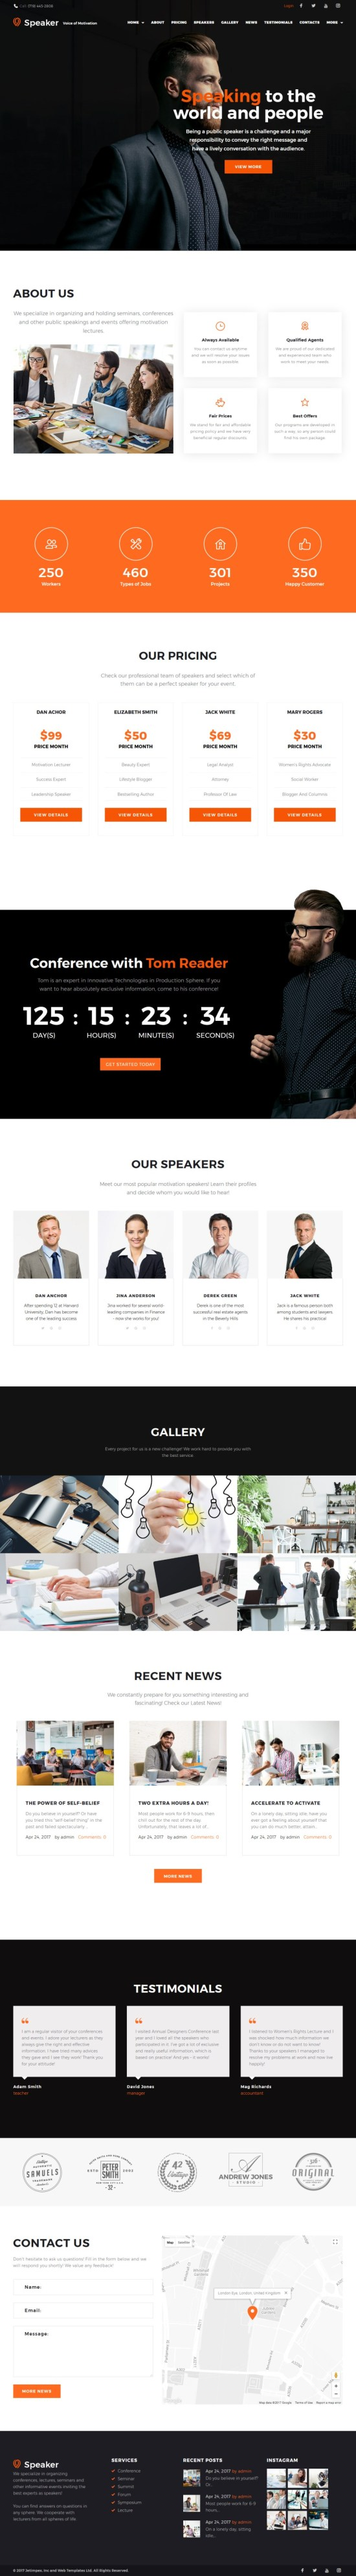 speaker wordpress theme - Speaker WordPress Theme